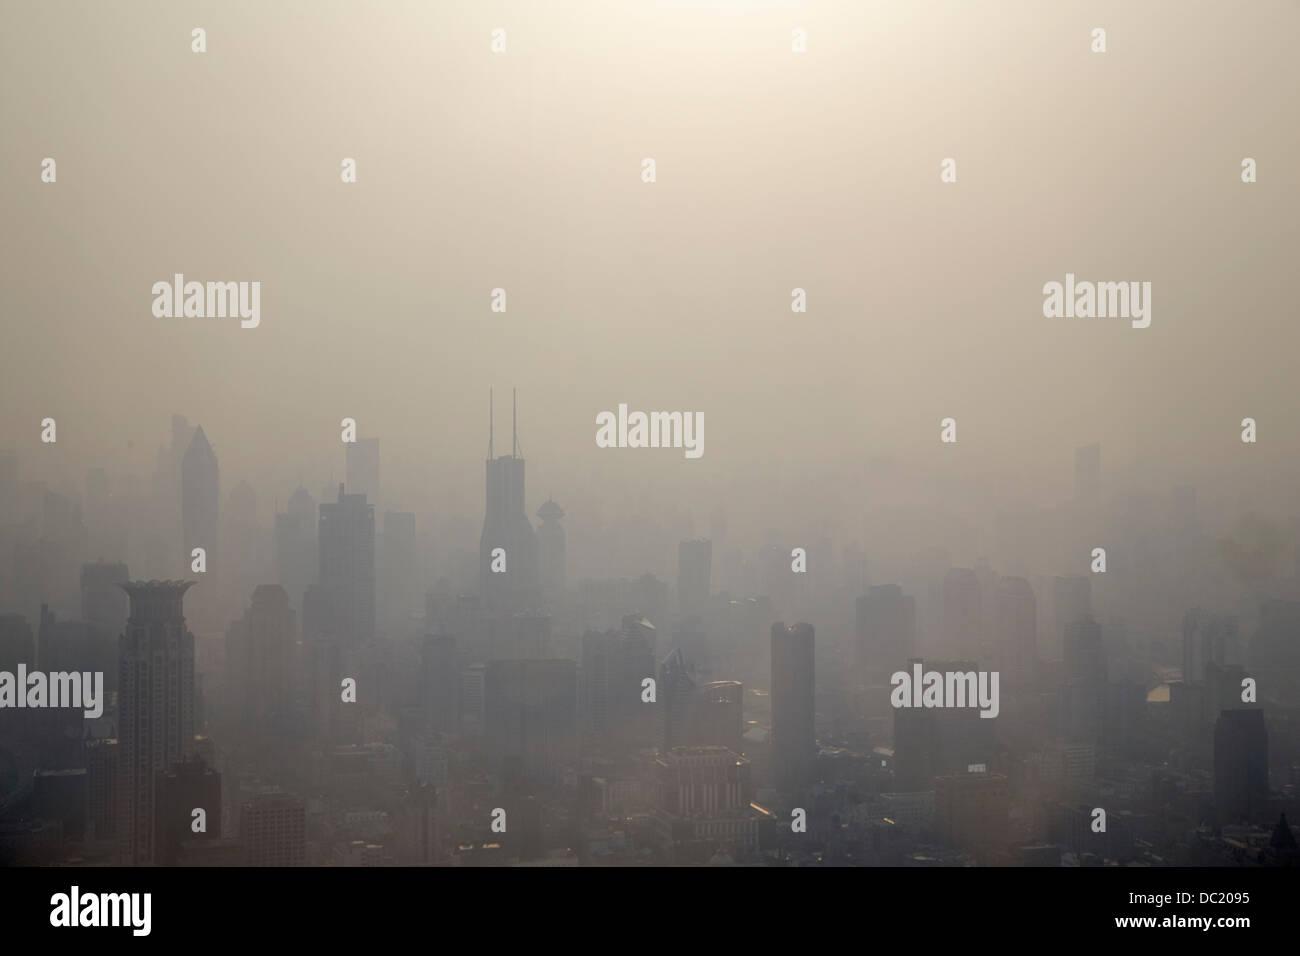 Mist over Shanghai cityscape, China - Stock Image